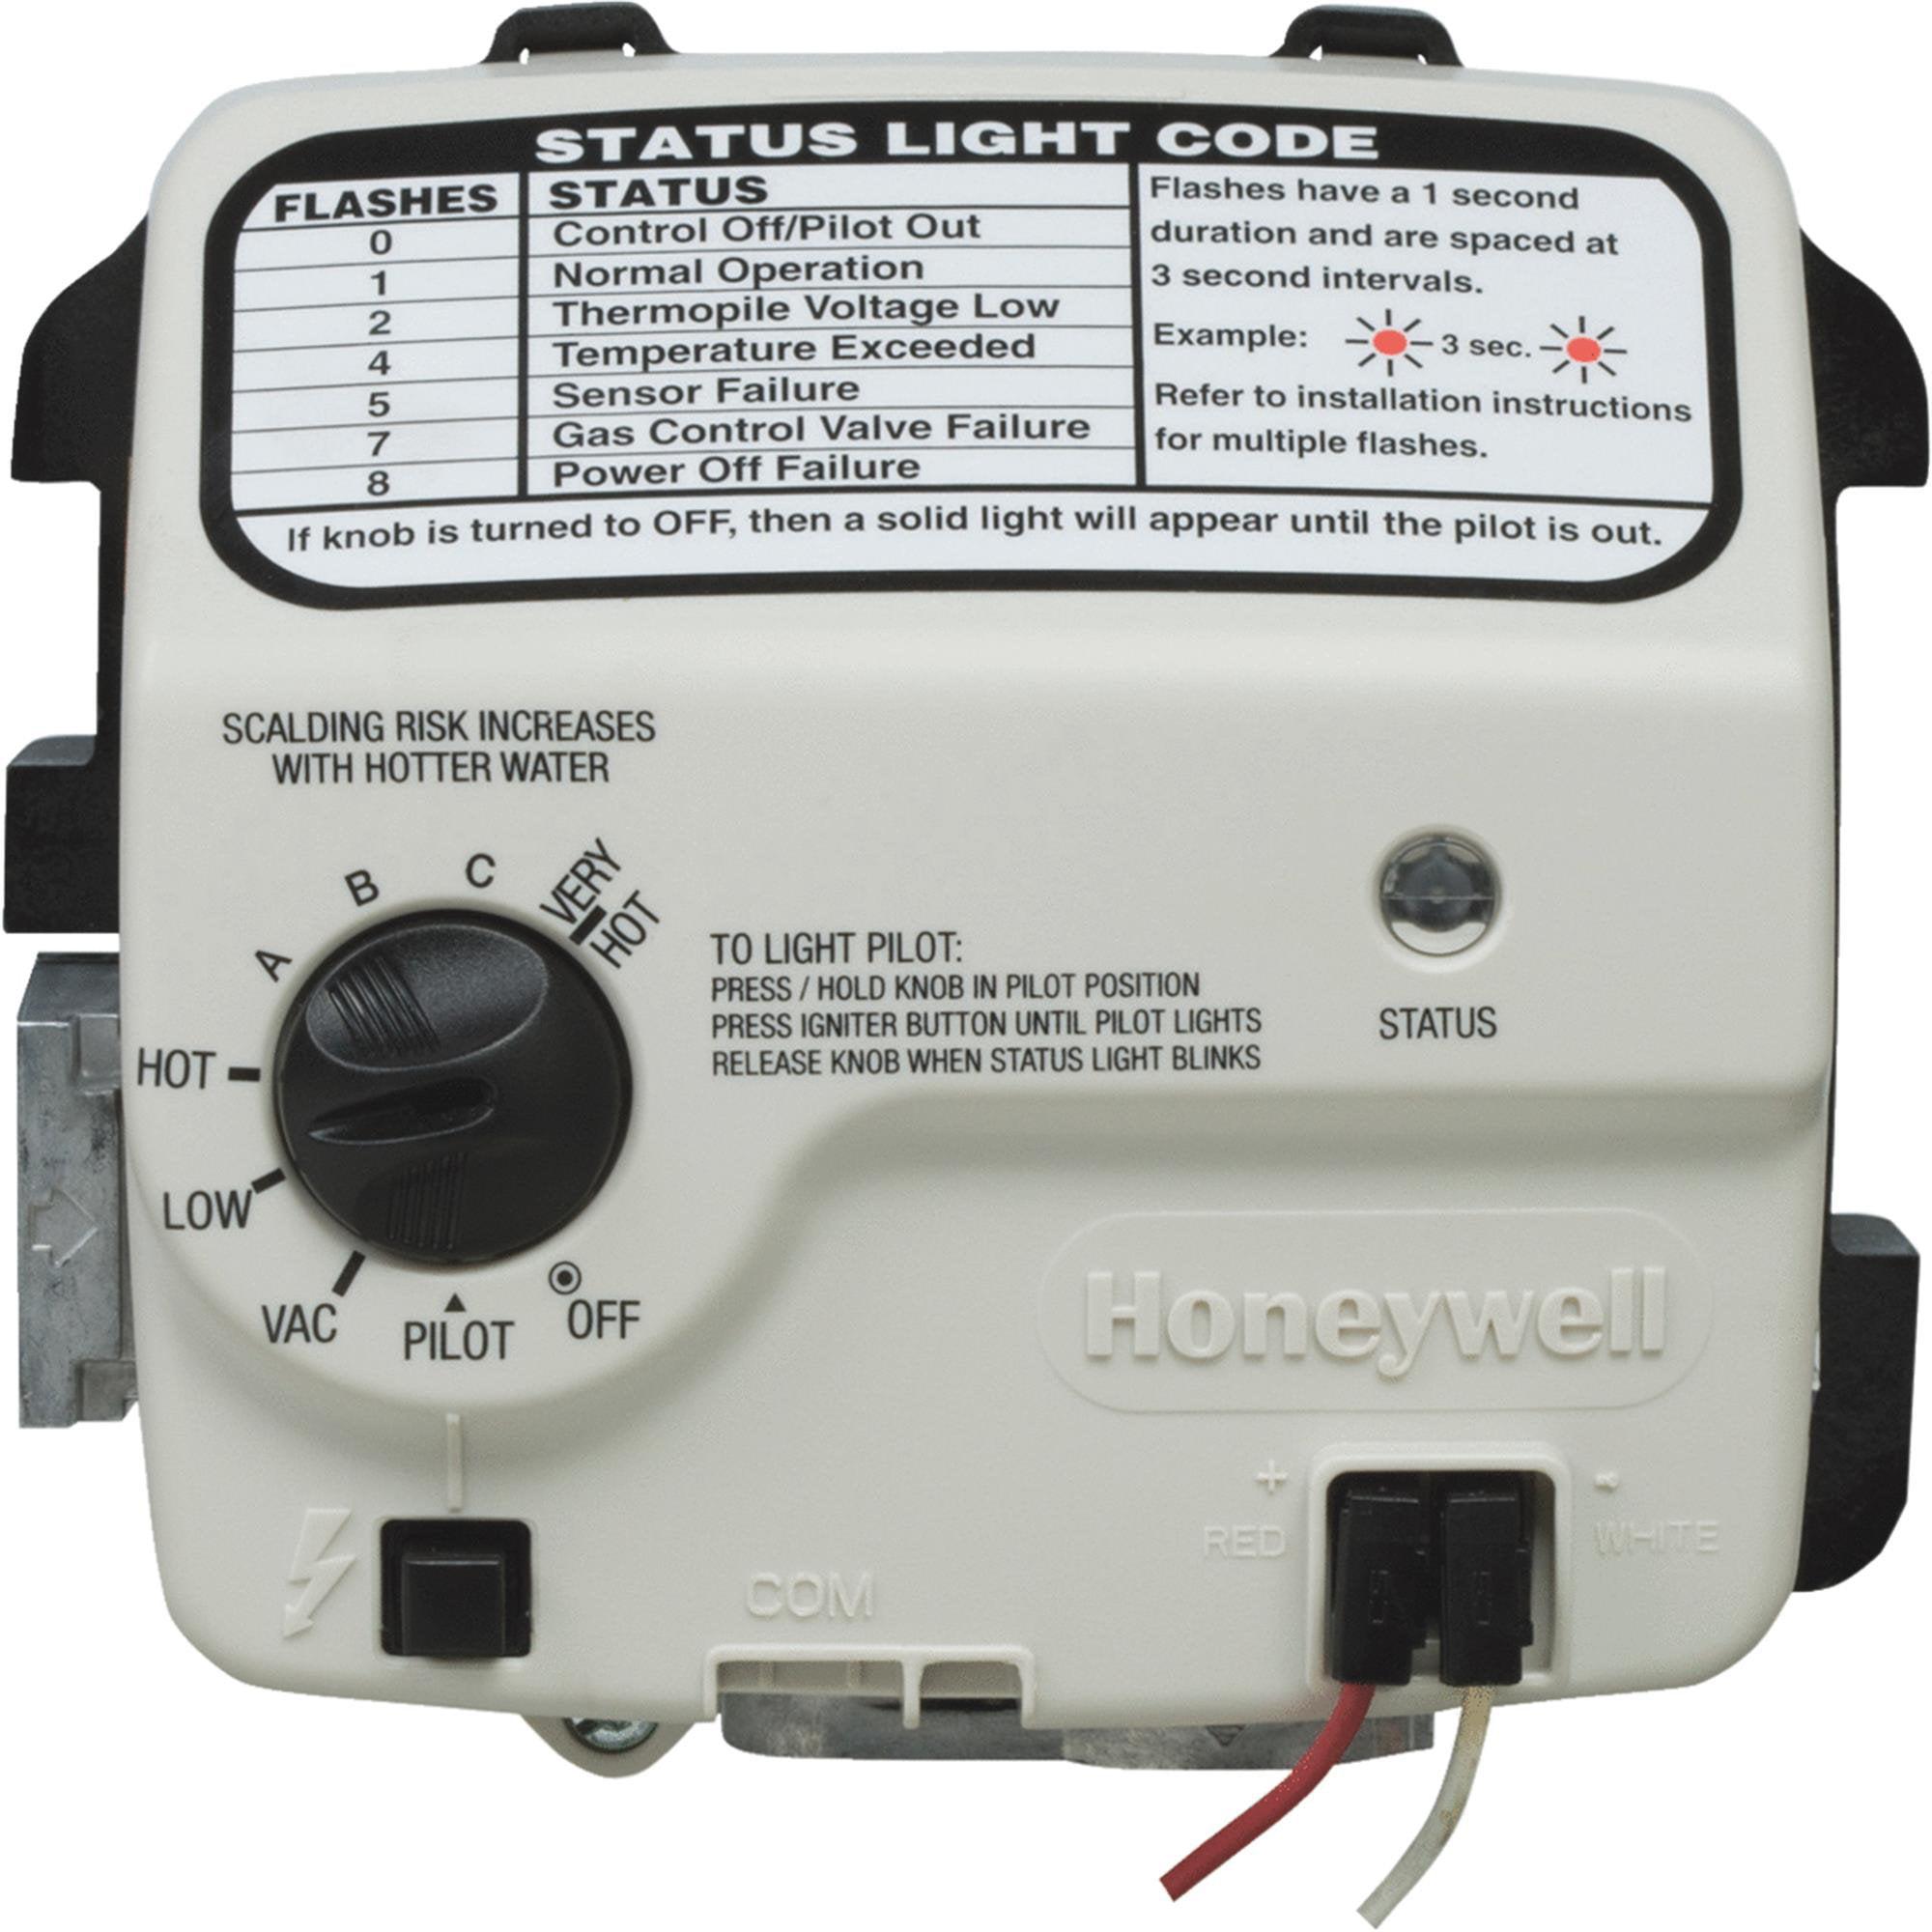 Reliance 301 Series Honeywell Electronic LP Gas Control Valve